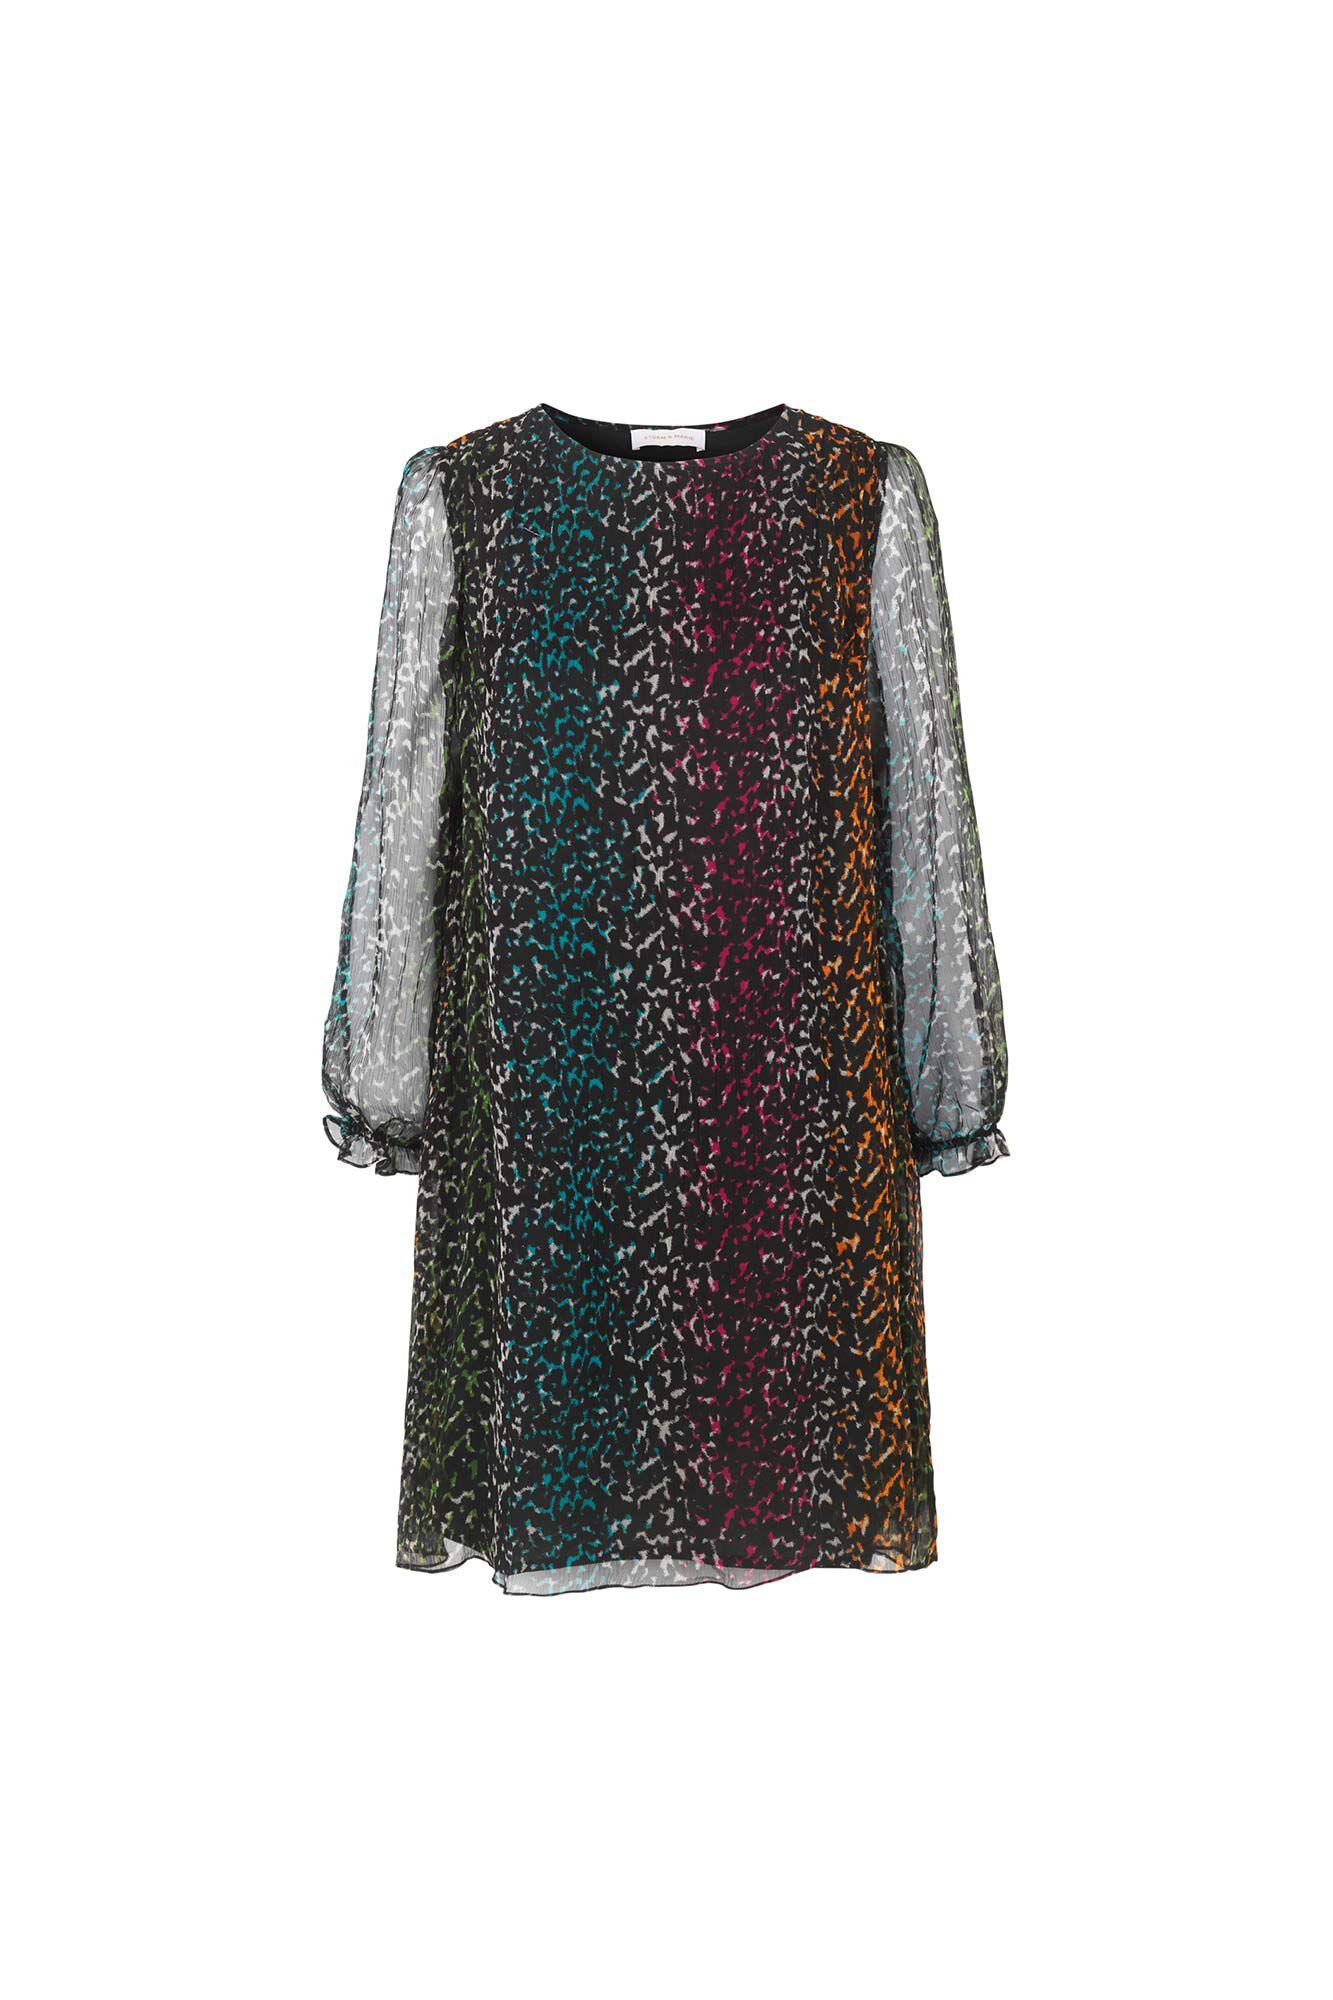 Brave dress SM1099, RAINBOW LEO